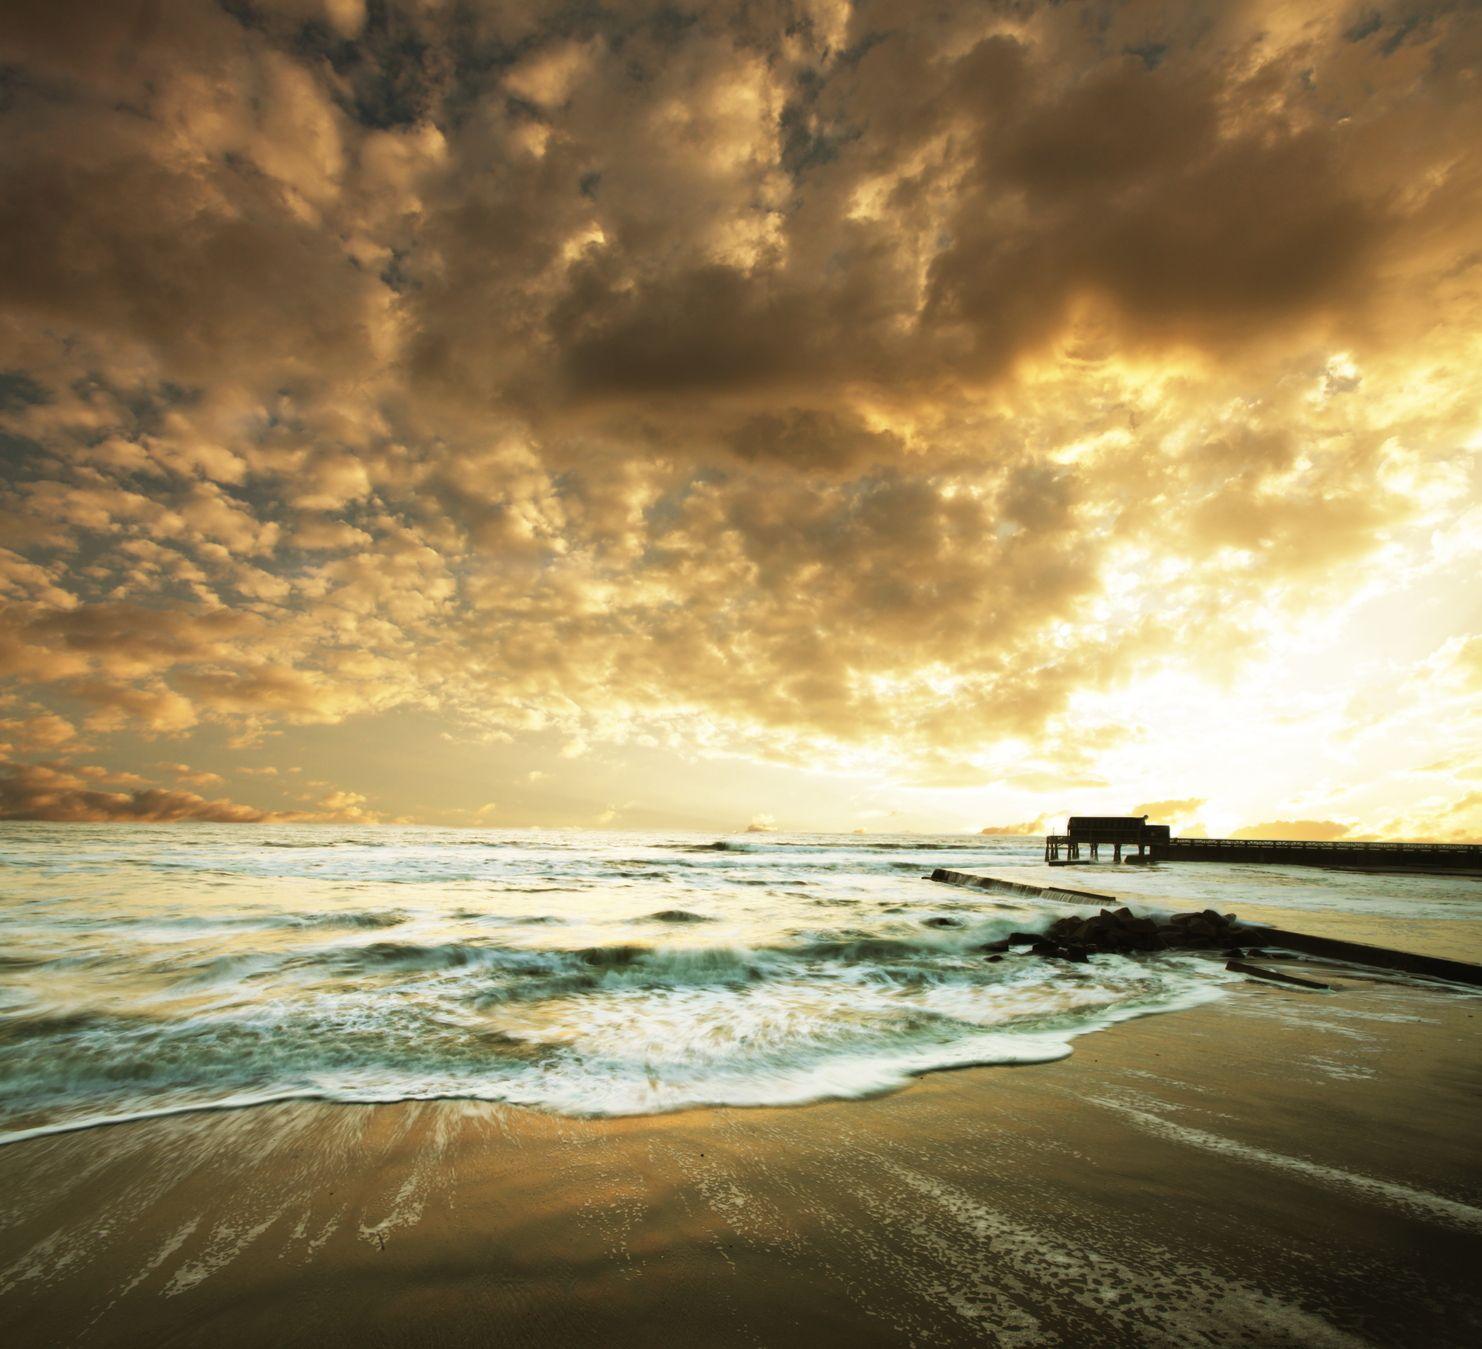 Beach before the sea